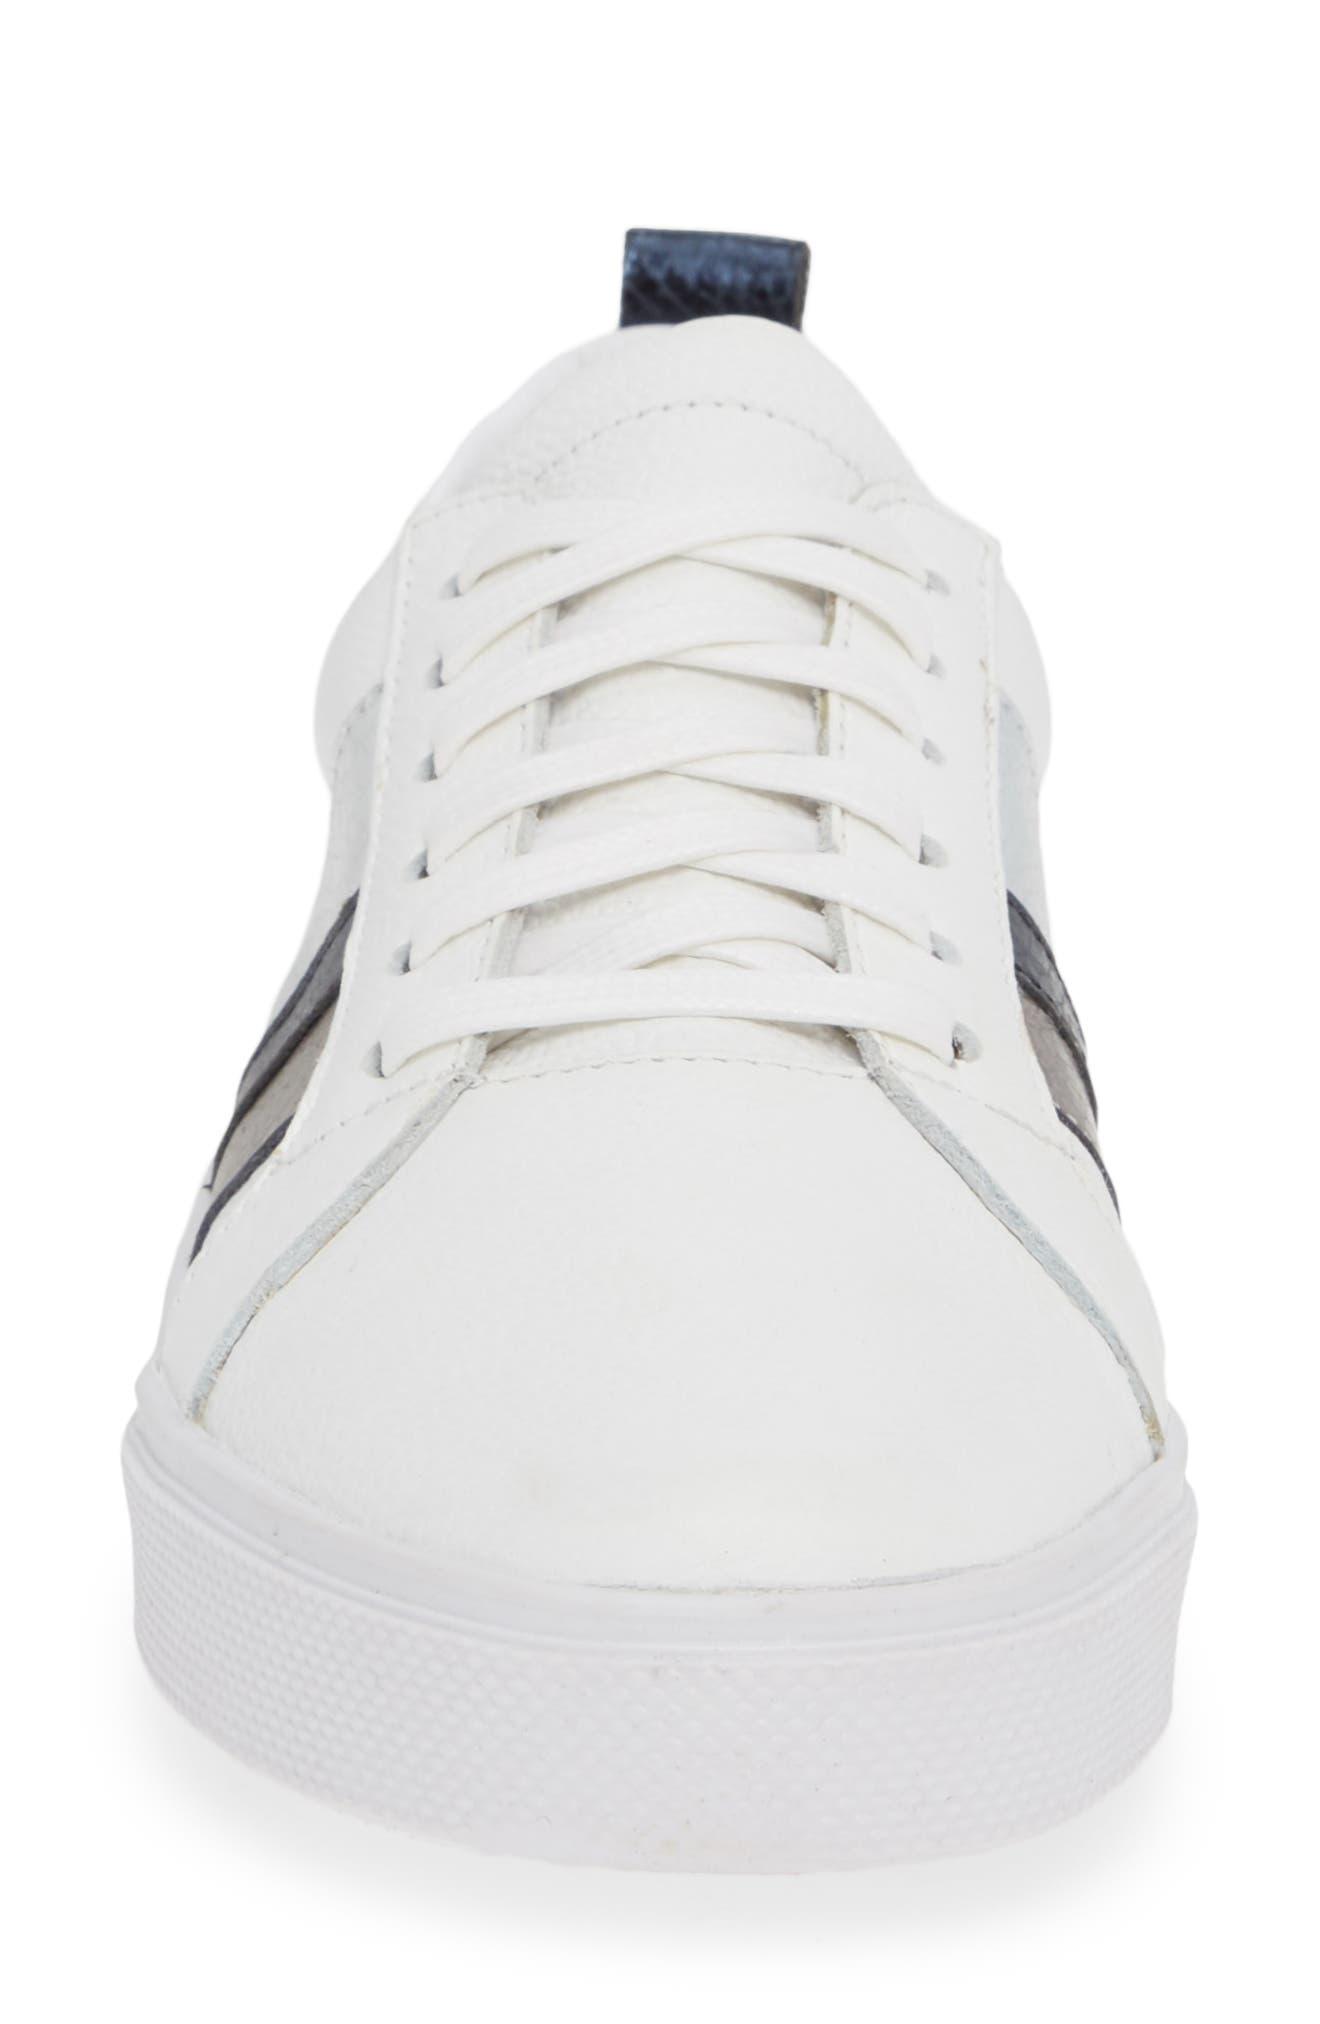 Bristol Sneaker,                             Alternate thumbnail 4, color,                             BLUE LEATHER